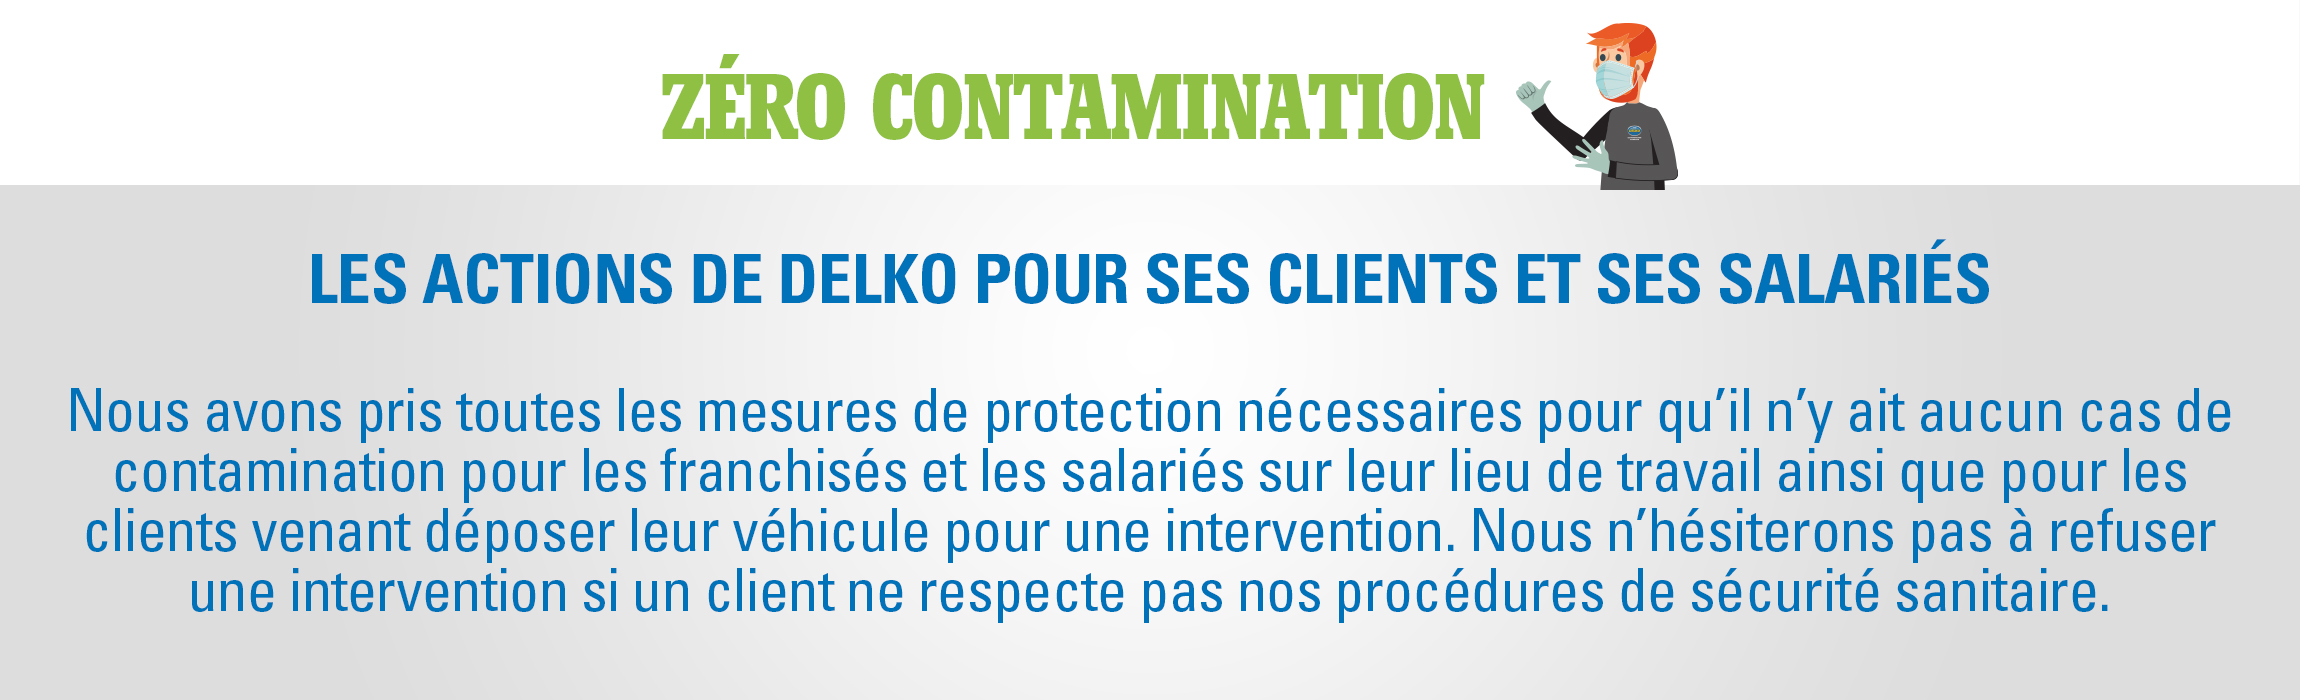 Delko : zéro contamination